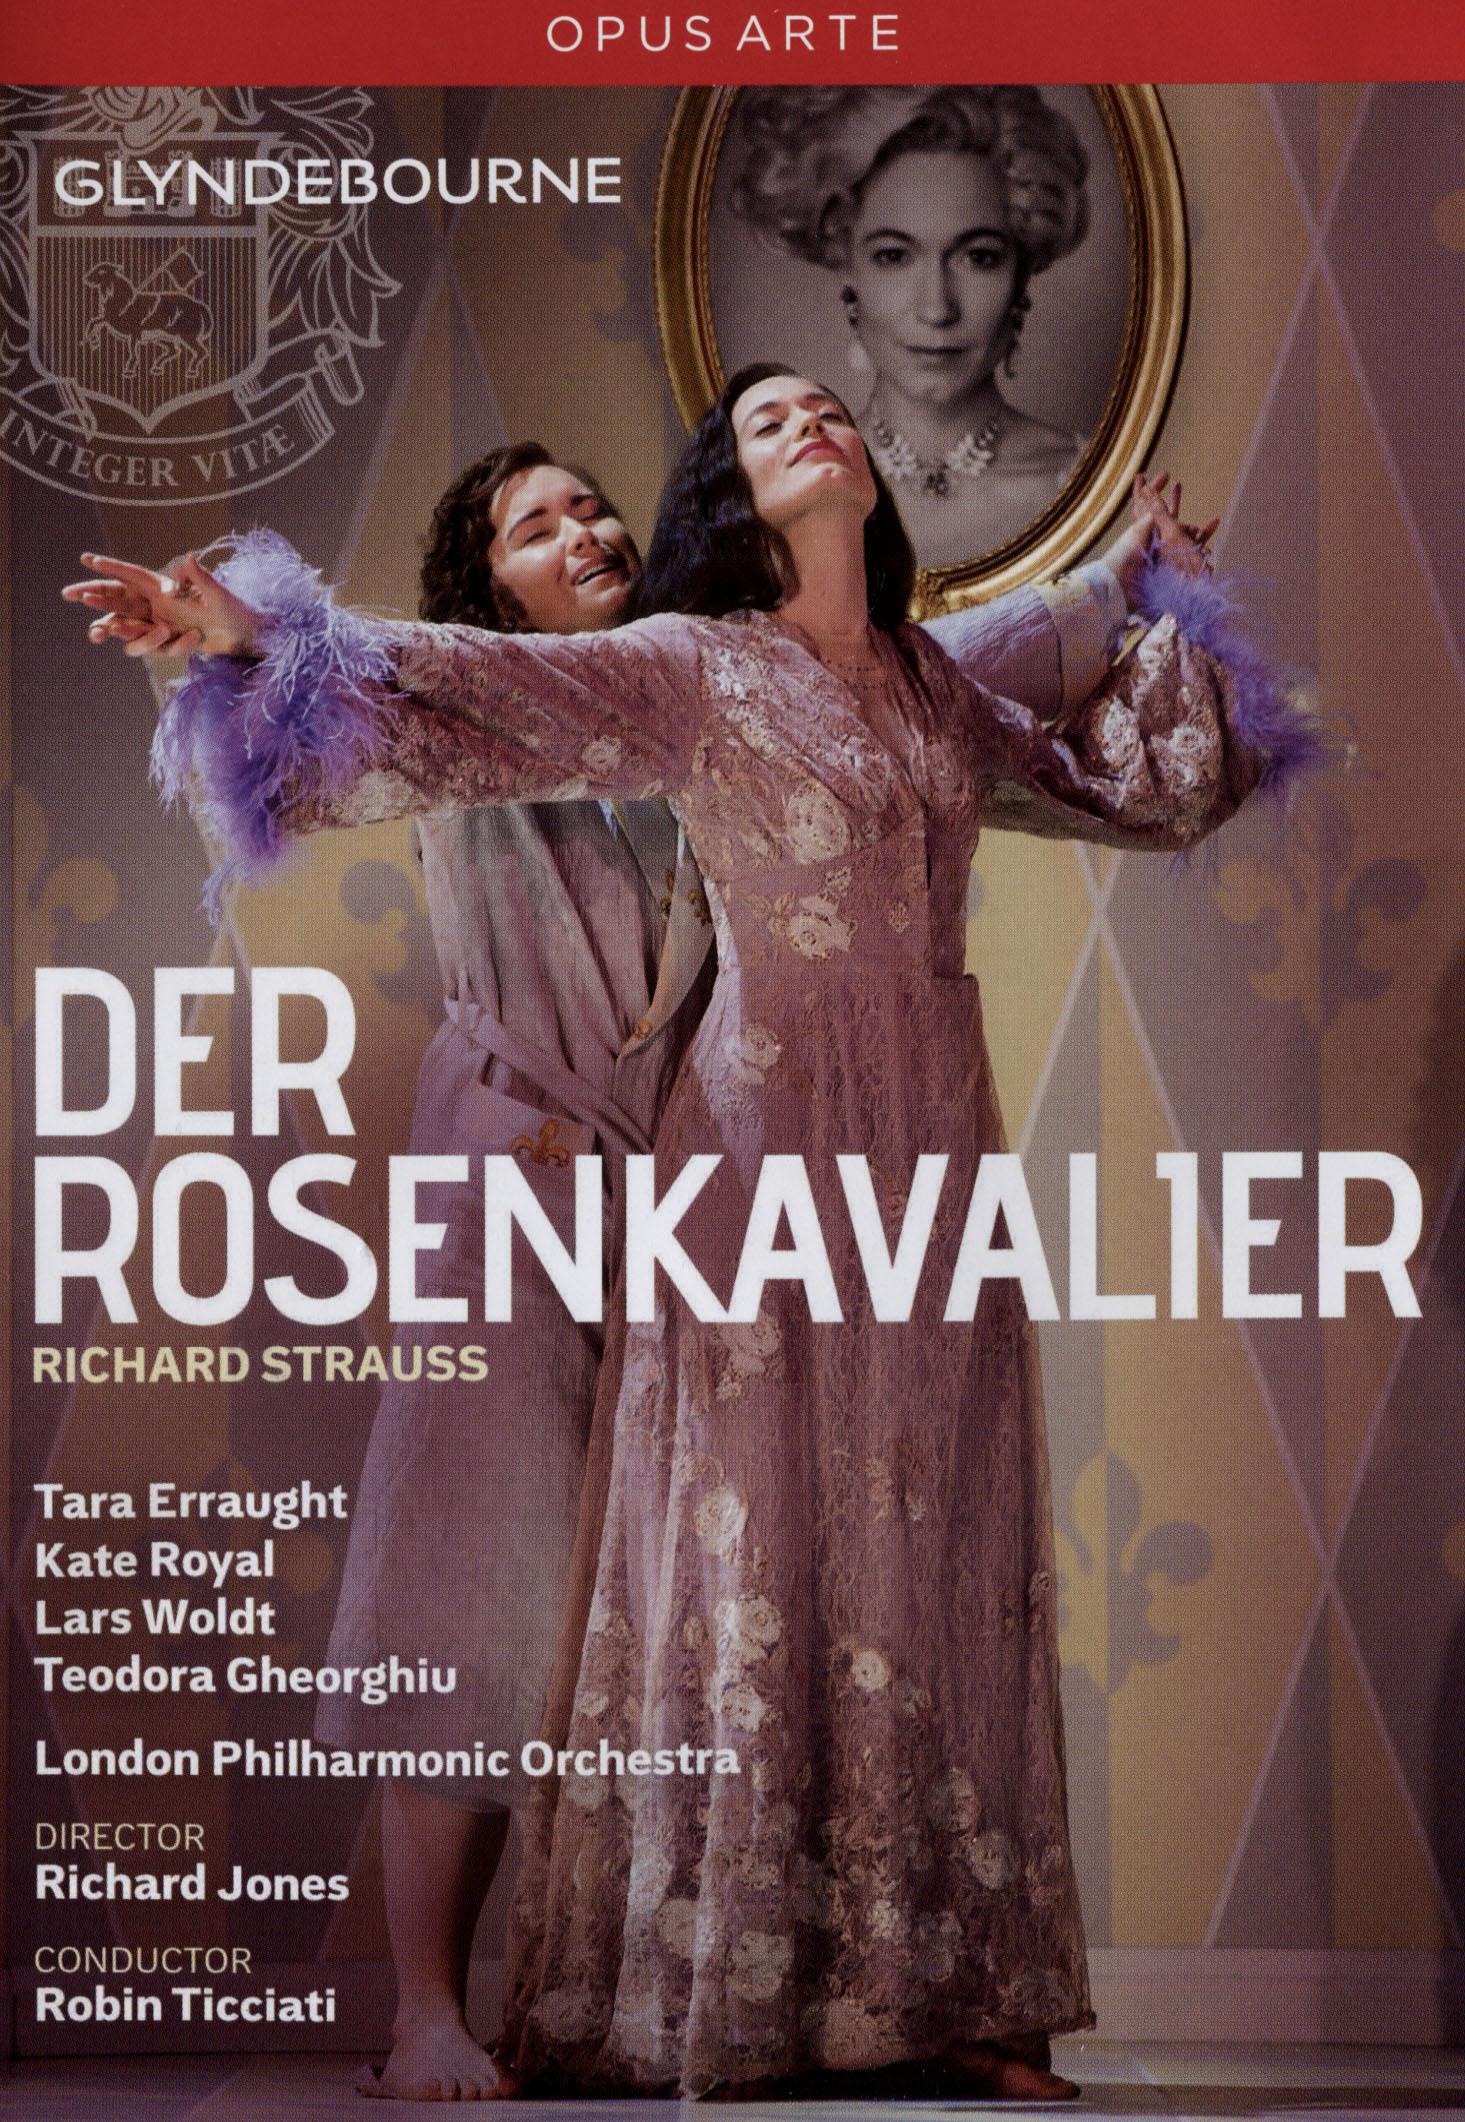 Der Rosenkavalier (Glyndebourne)